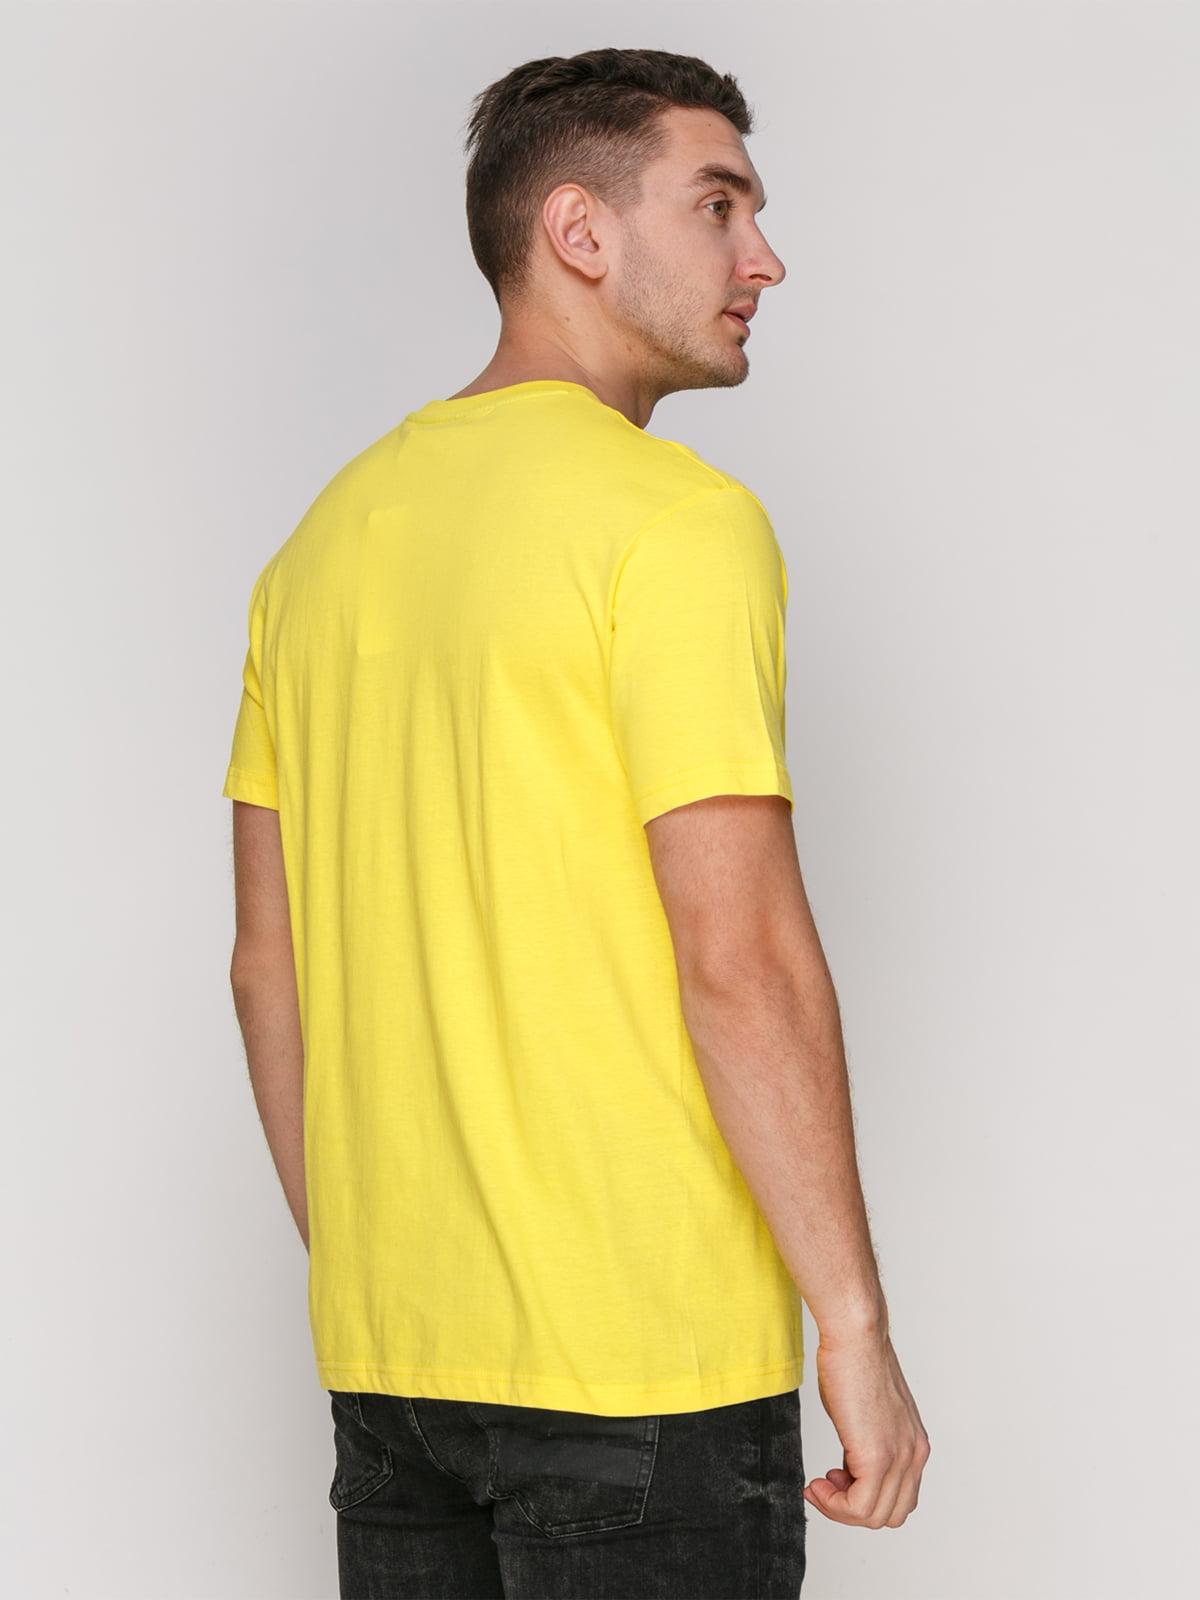 Футболка жовта з принтом | 4854956 | фото 2